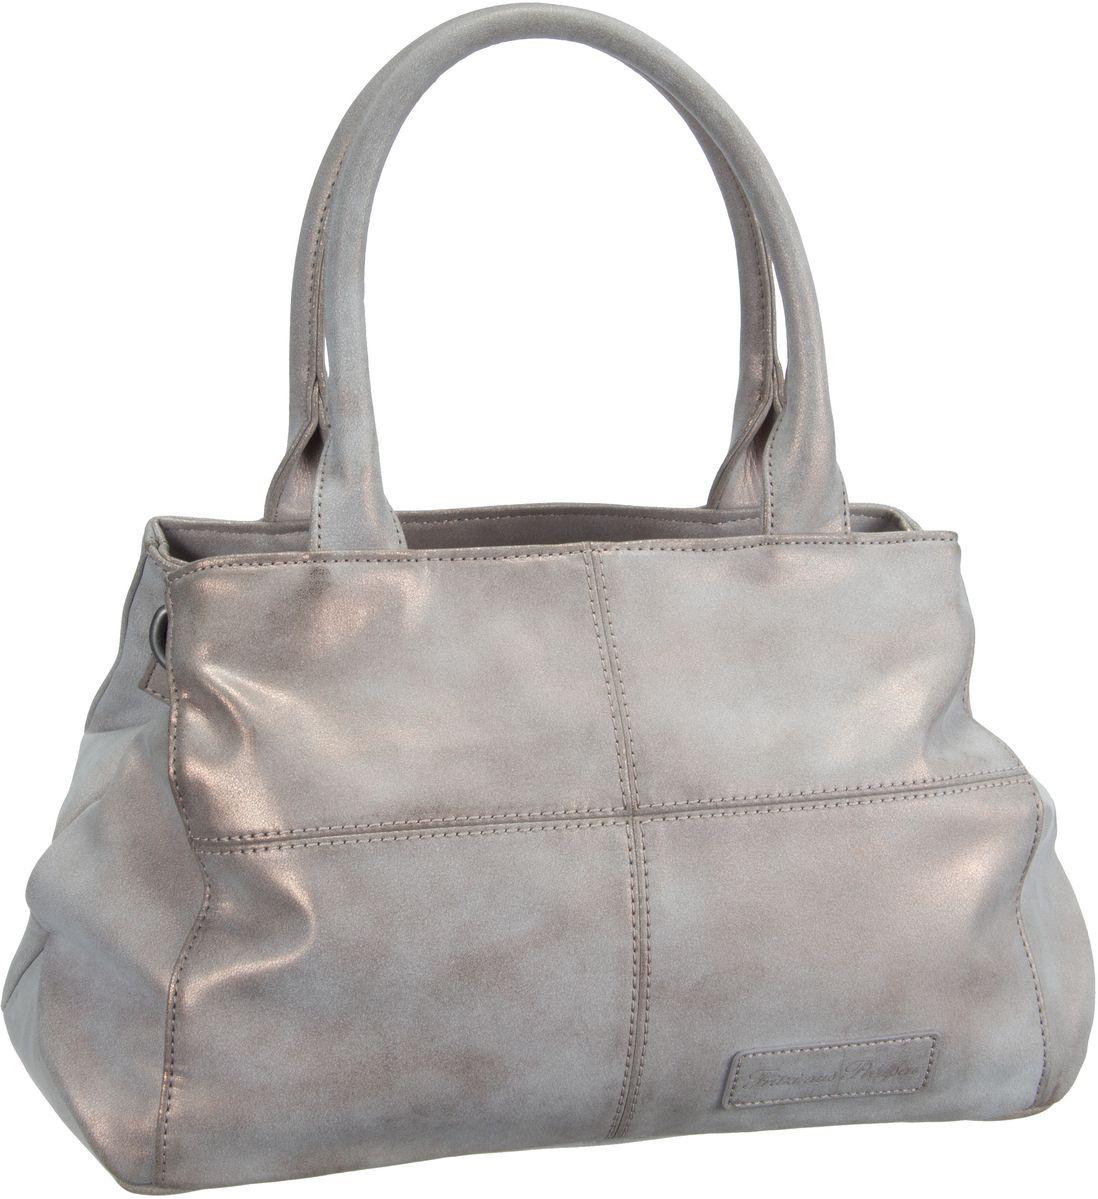 Handtasche Zoe Sidney Shiny Dusty Rose